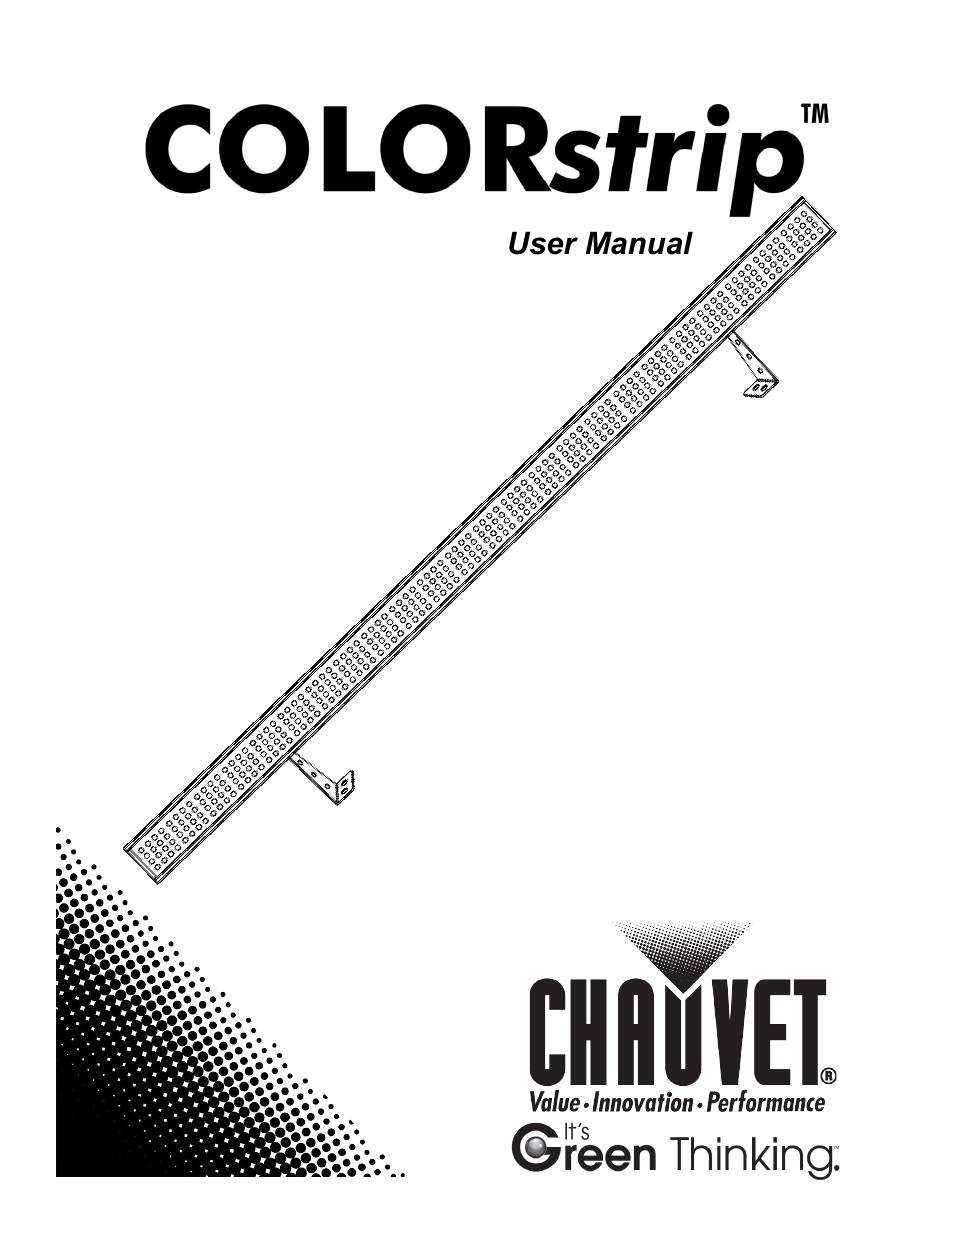 chauvet colorstrip user manual 17 pages rh manualsdir com chauvet dj owner's manual chauvet user manual